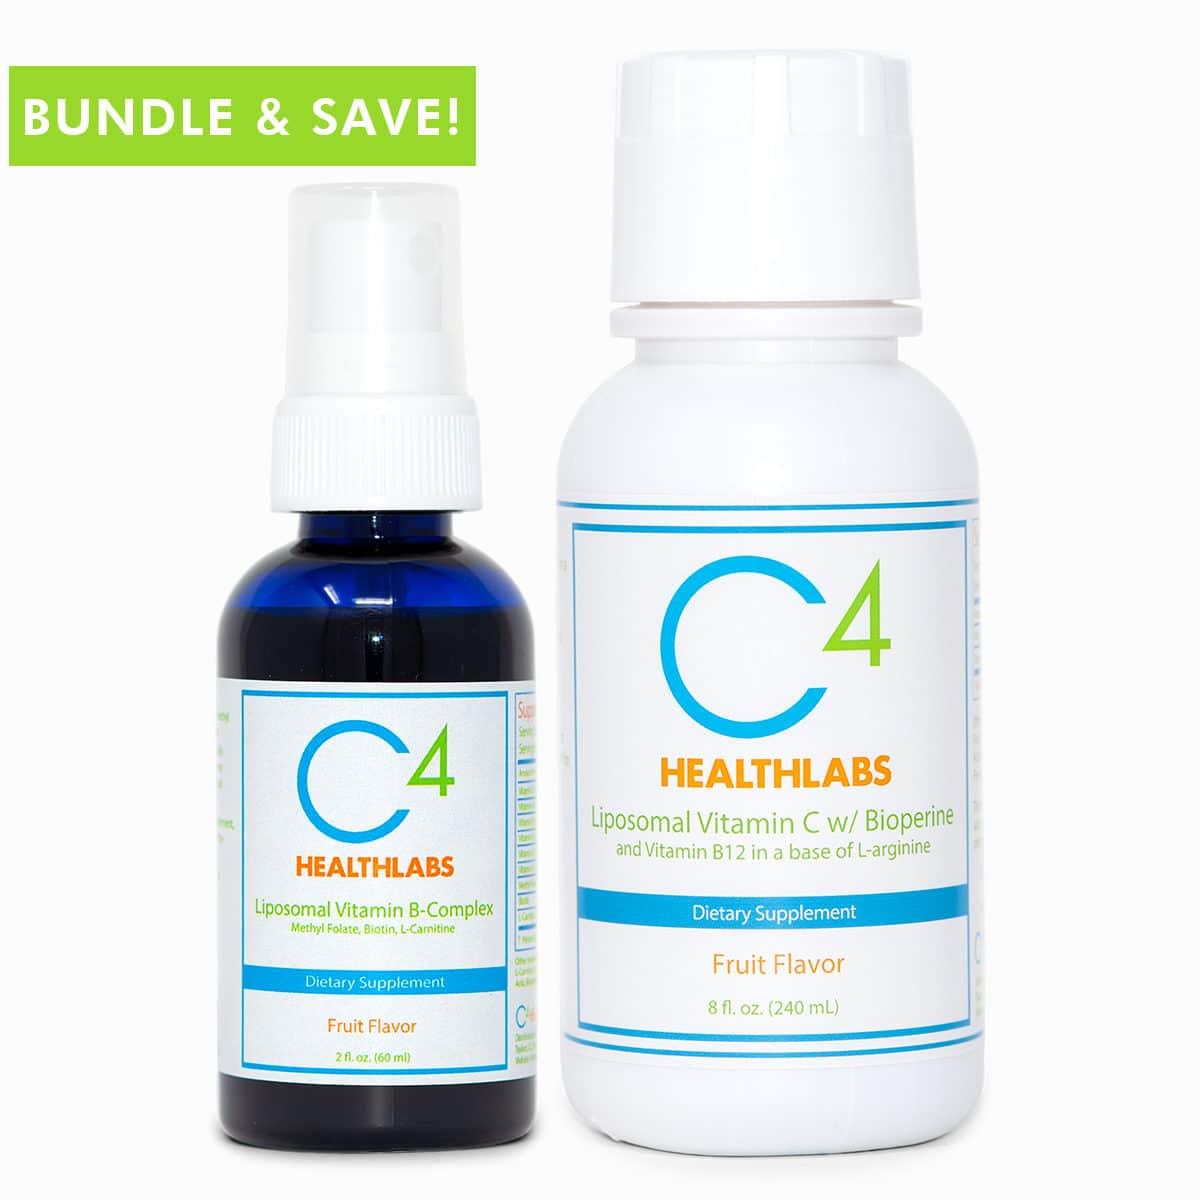 C4 Healthlabs Liposomal Vitamin Immunity Bundle